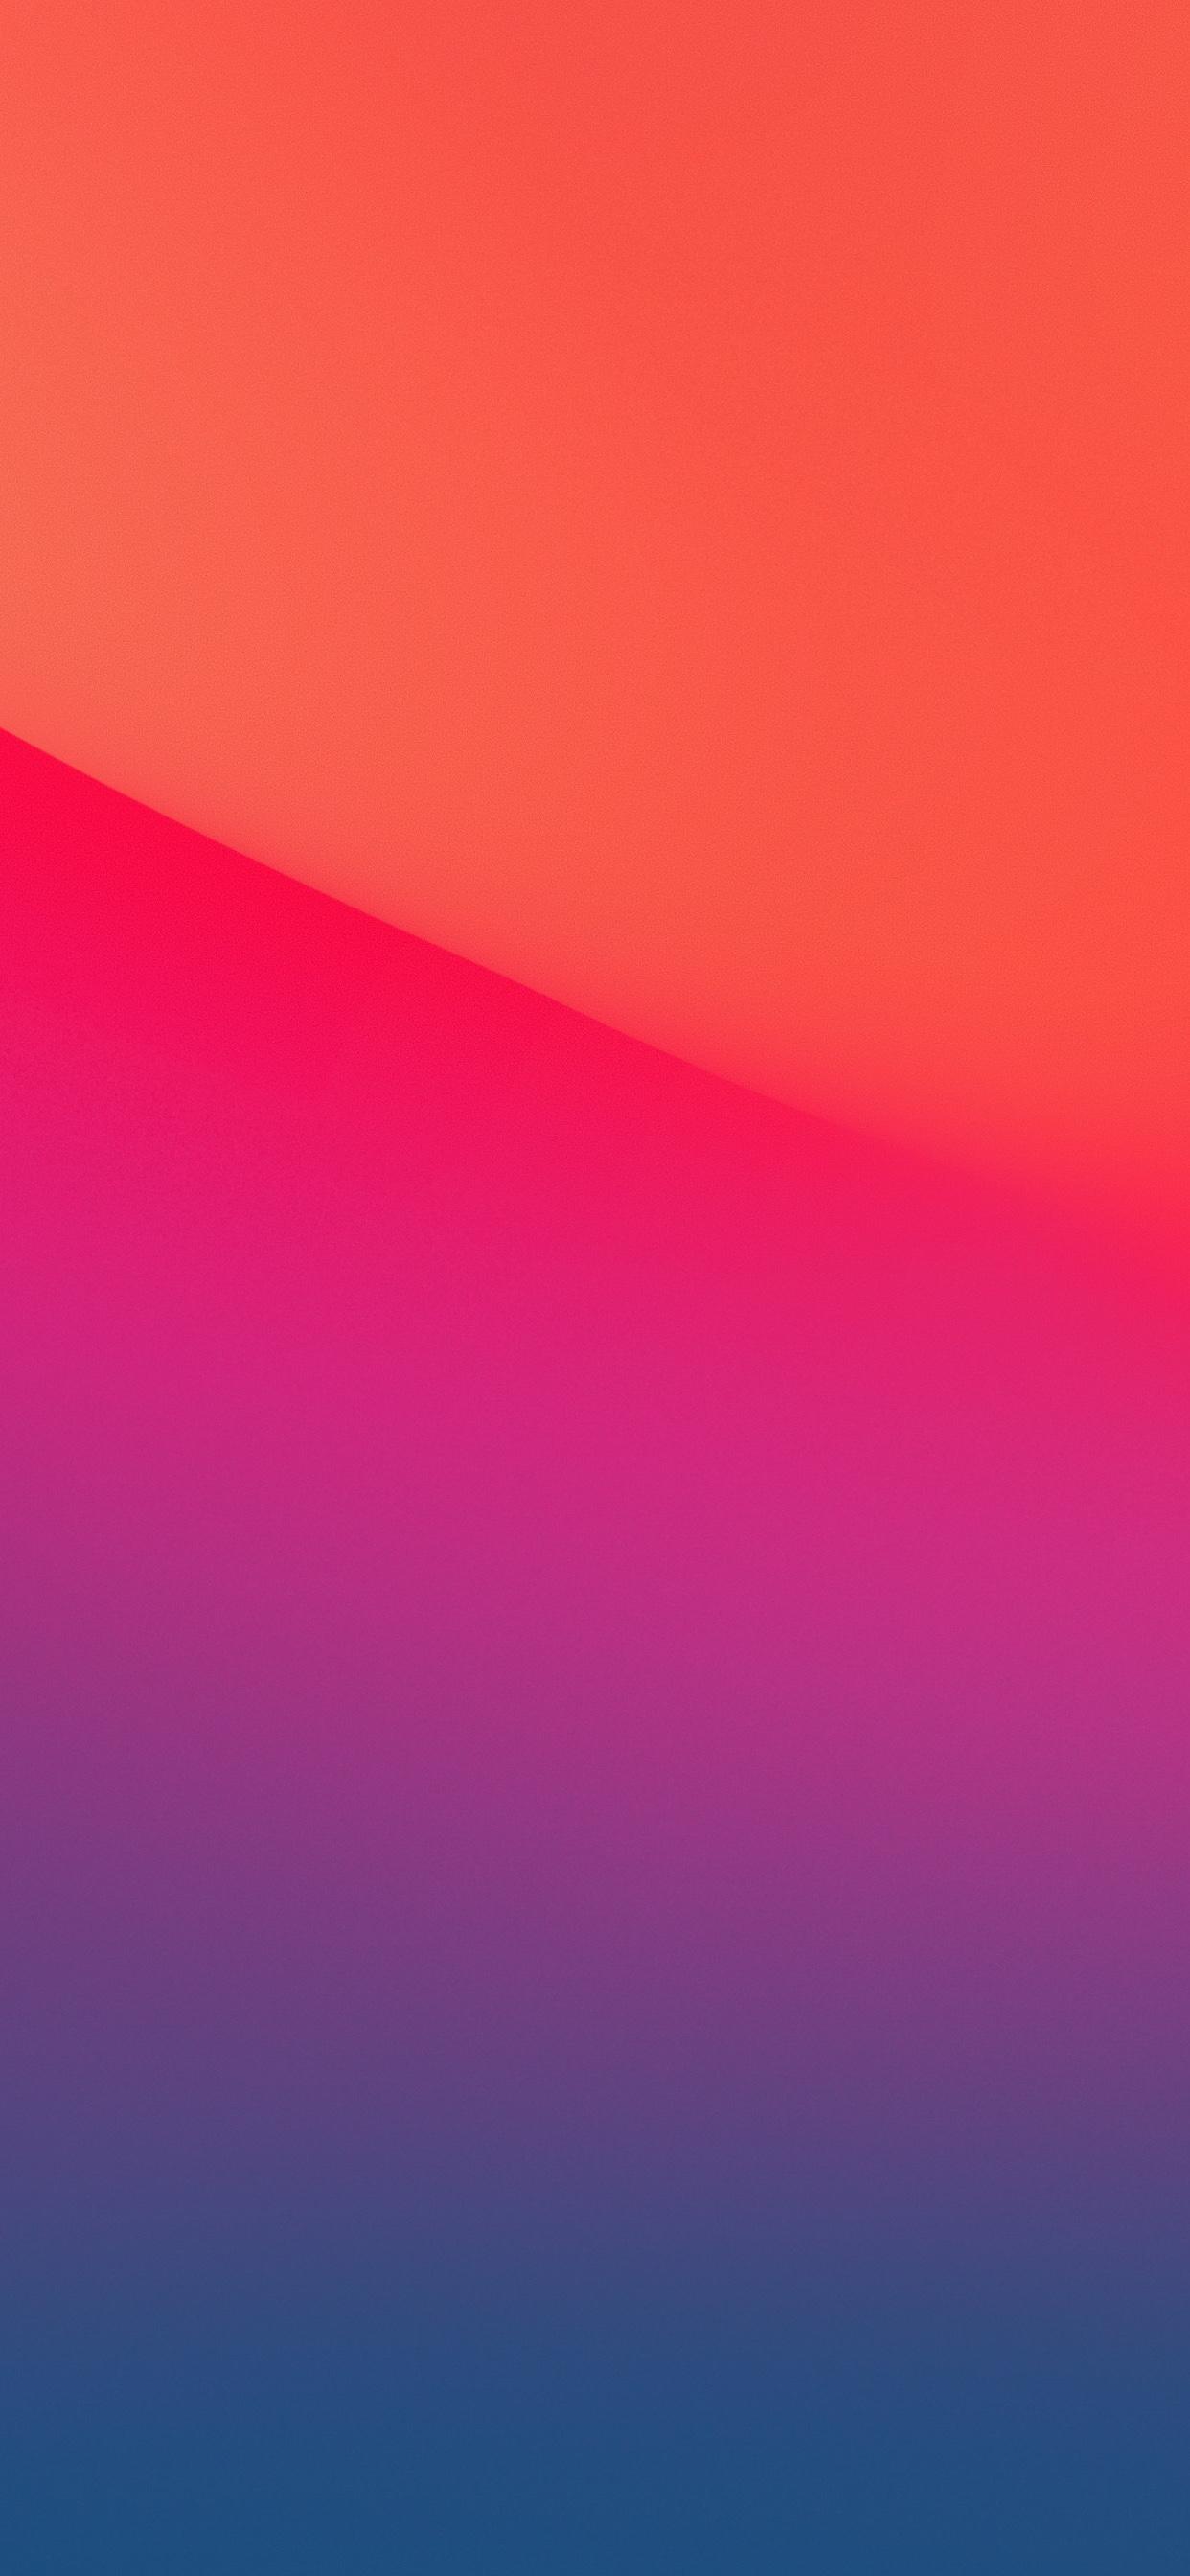 iOS 15 Concept wallpaper idownloadblog AR72014 based on macOS Big Sur